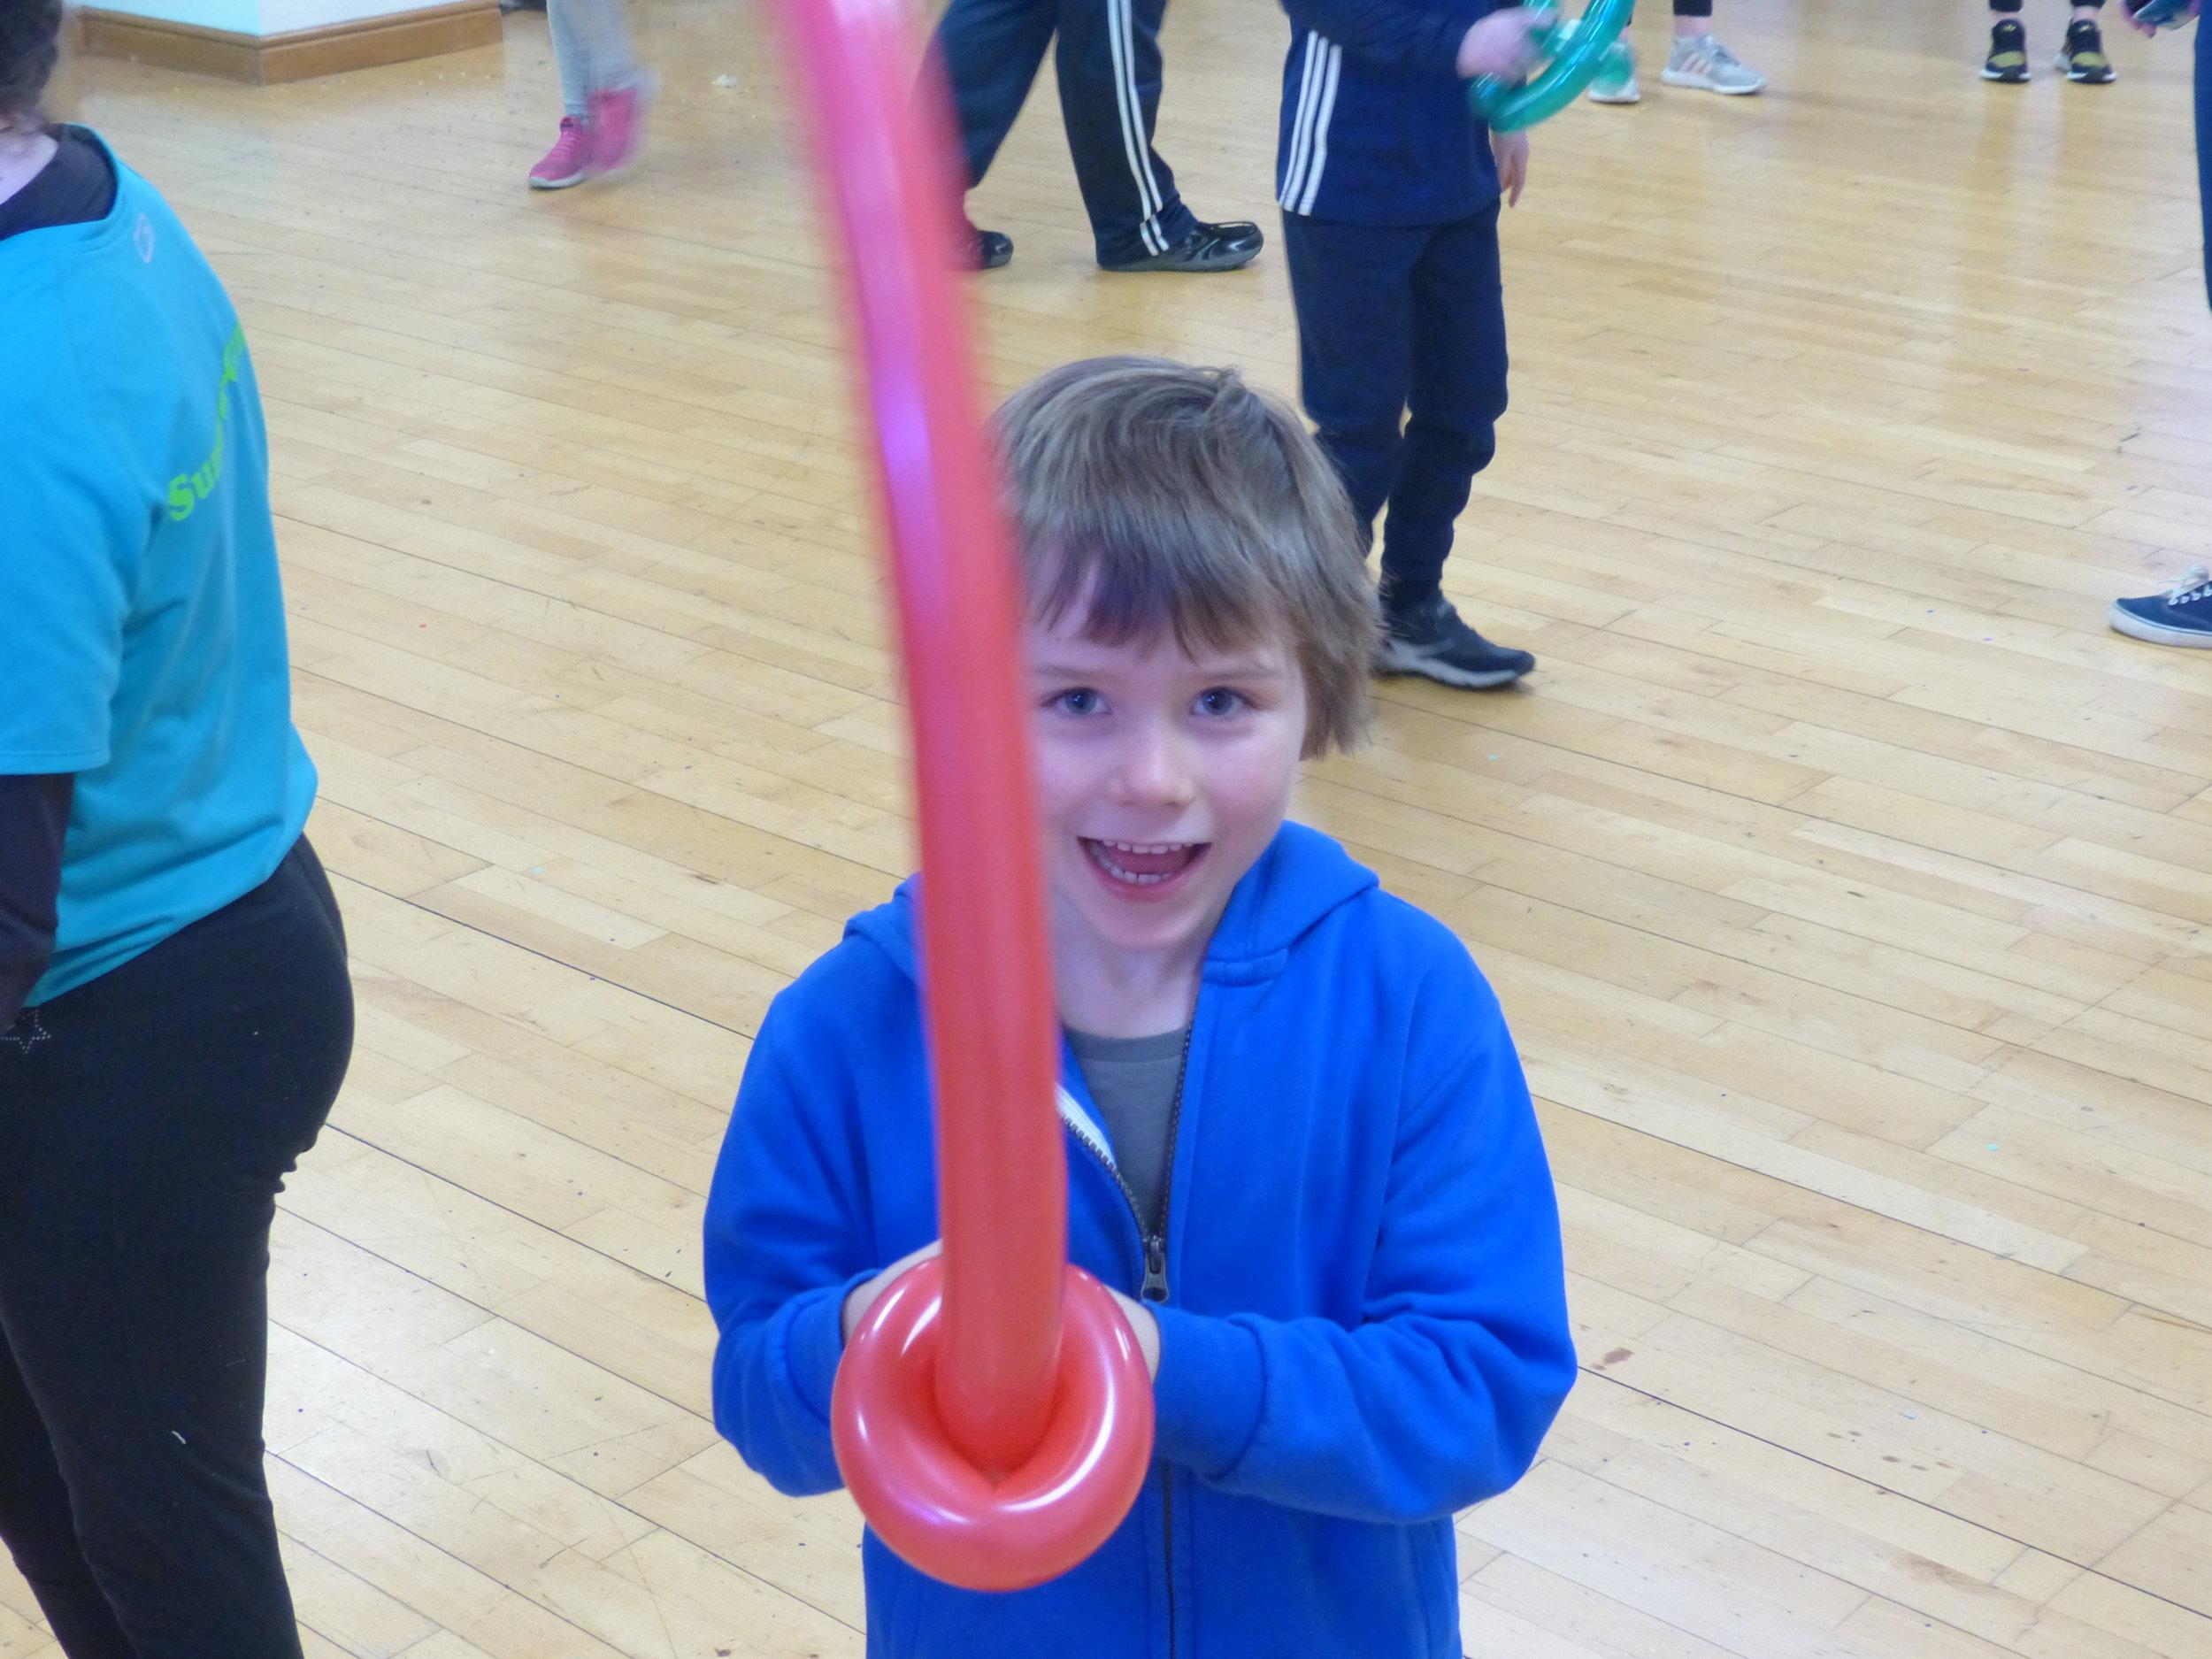 Balloon sword